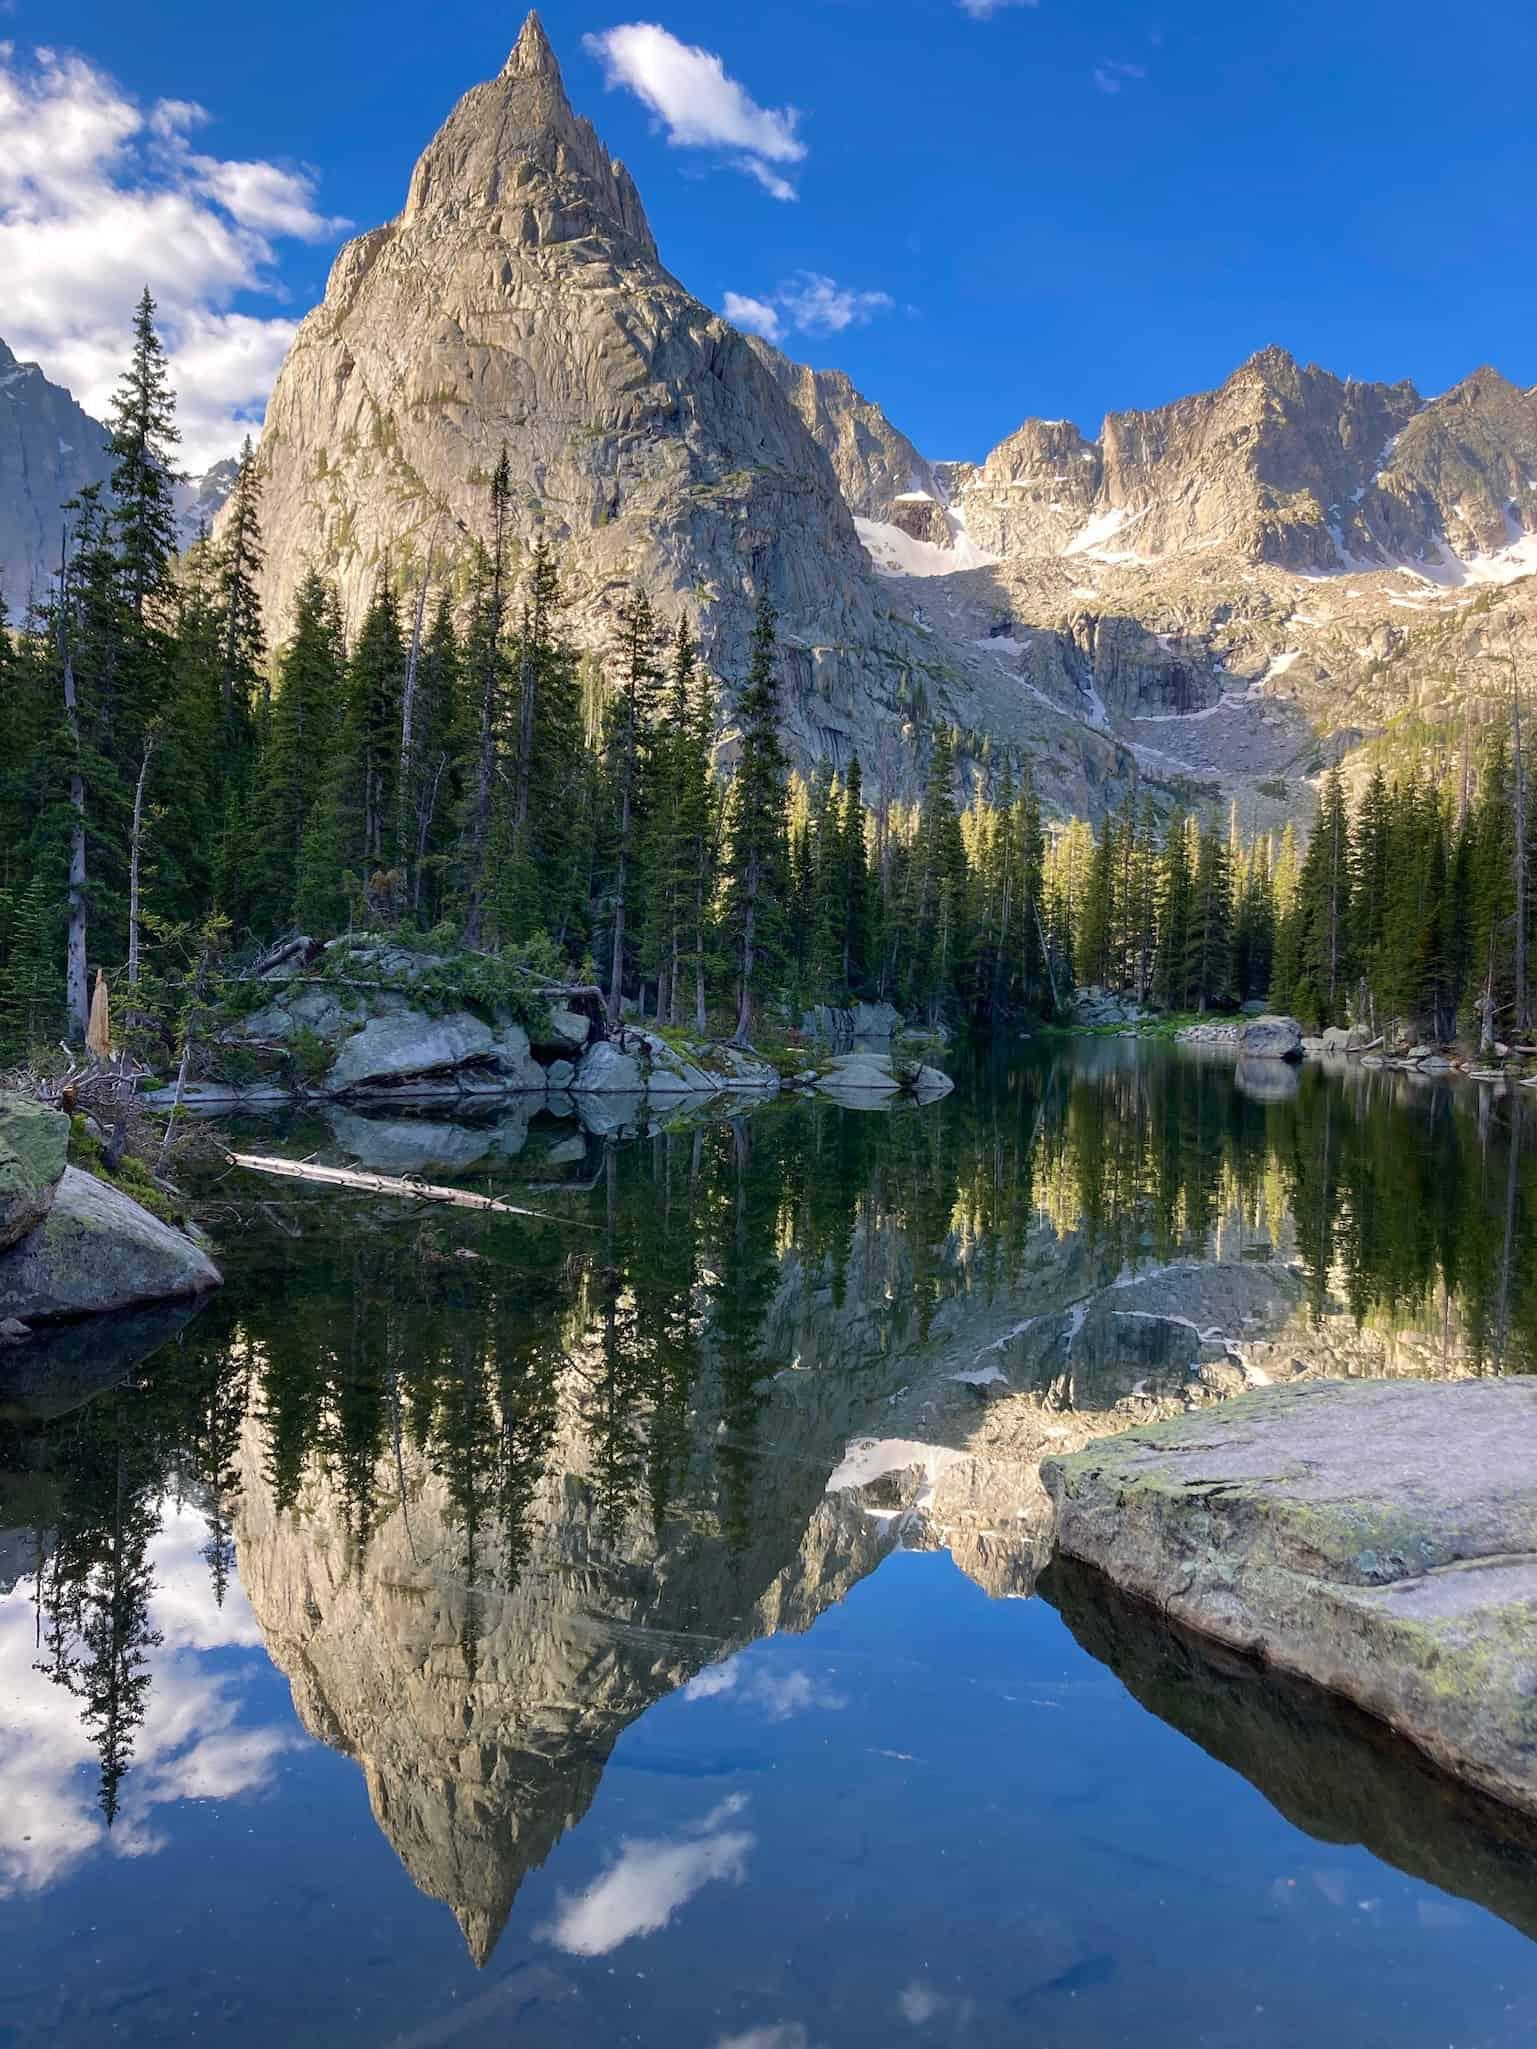 lone eagel over mirror lake